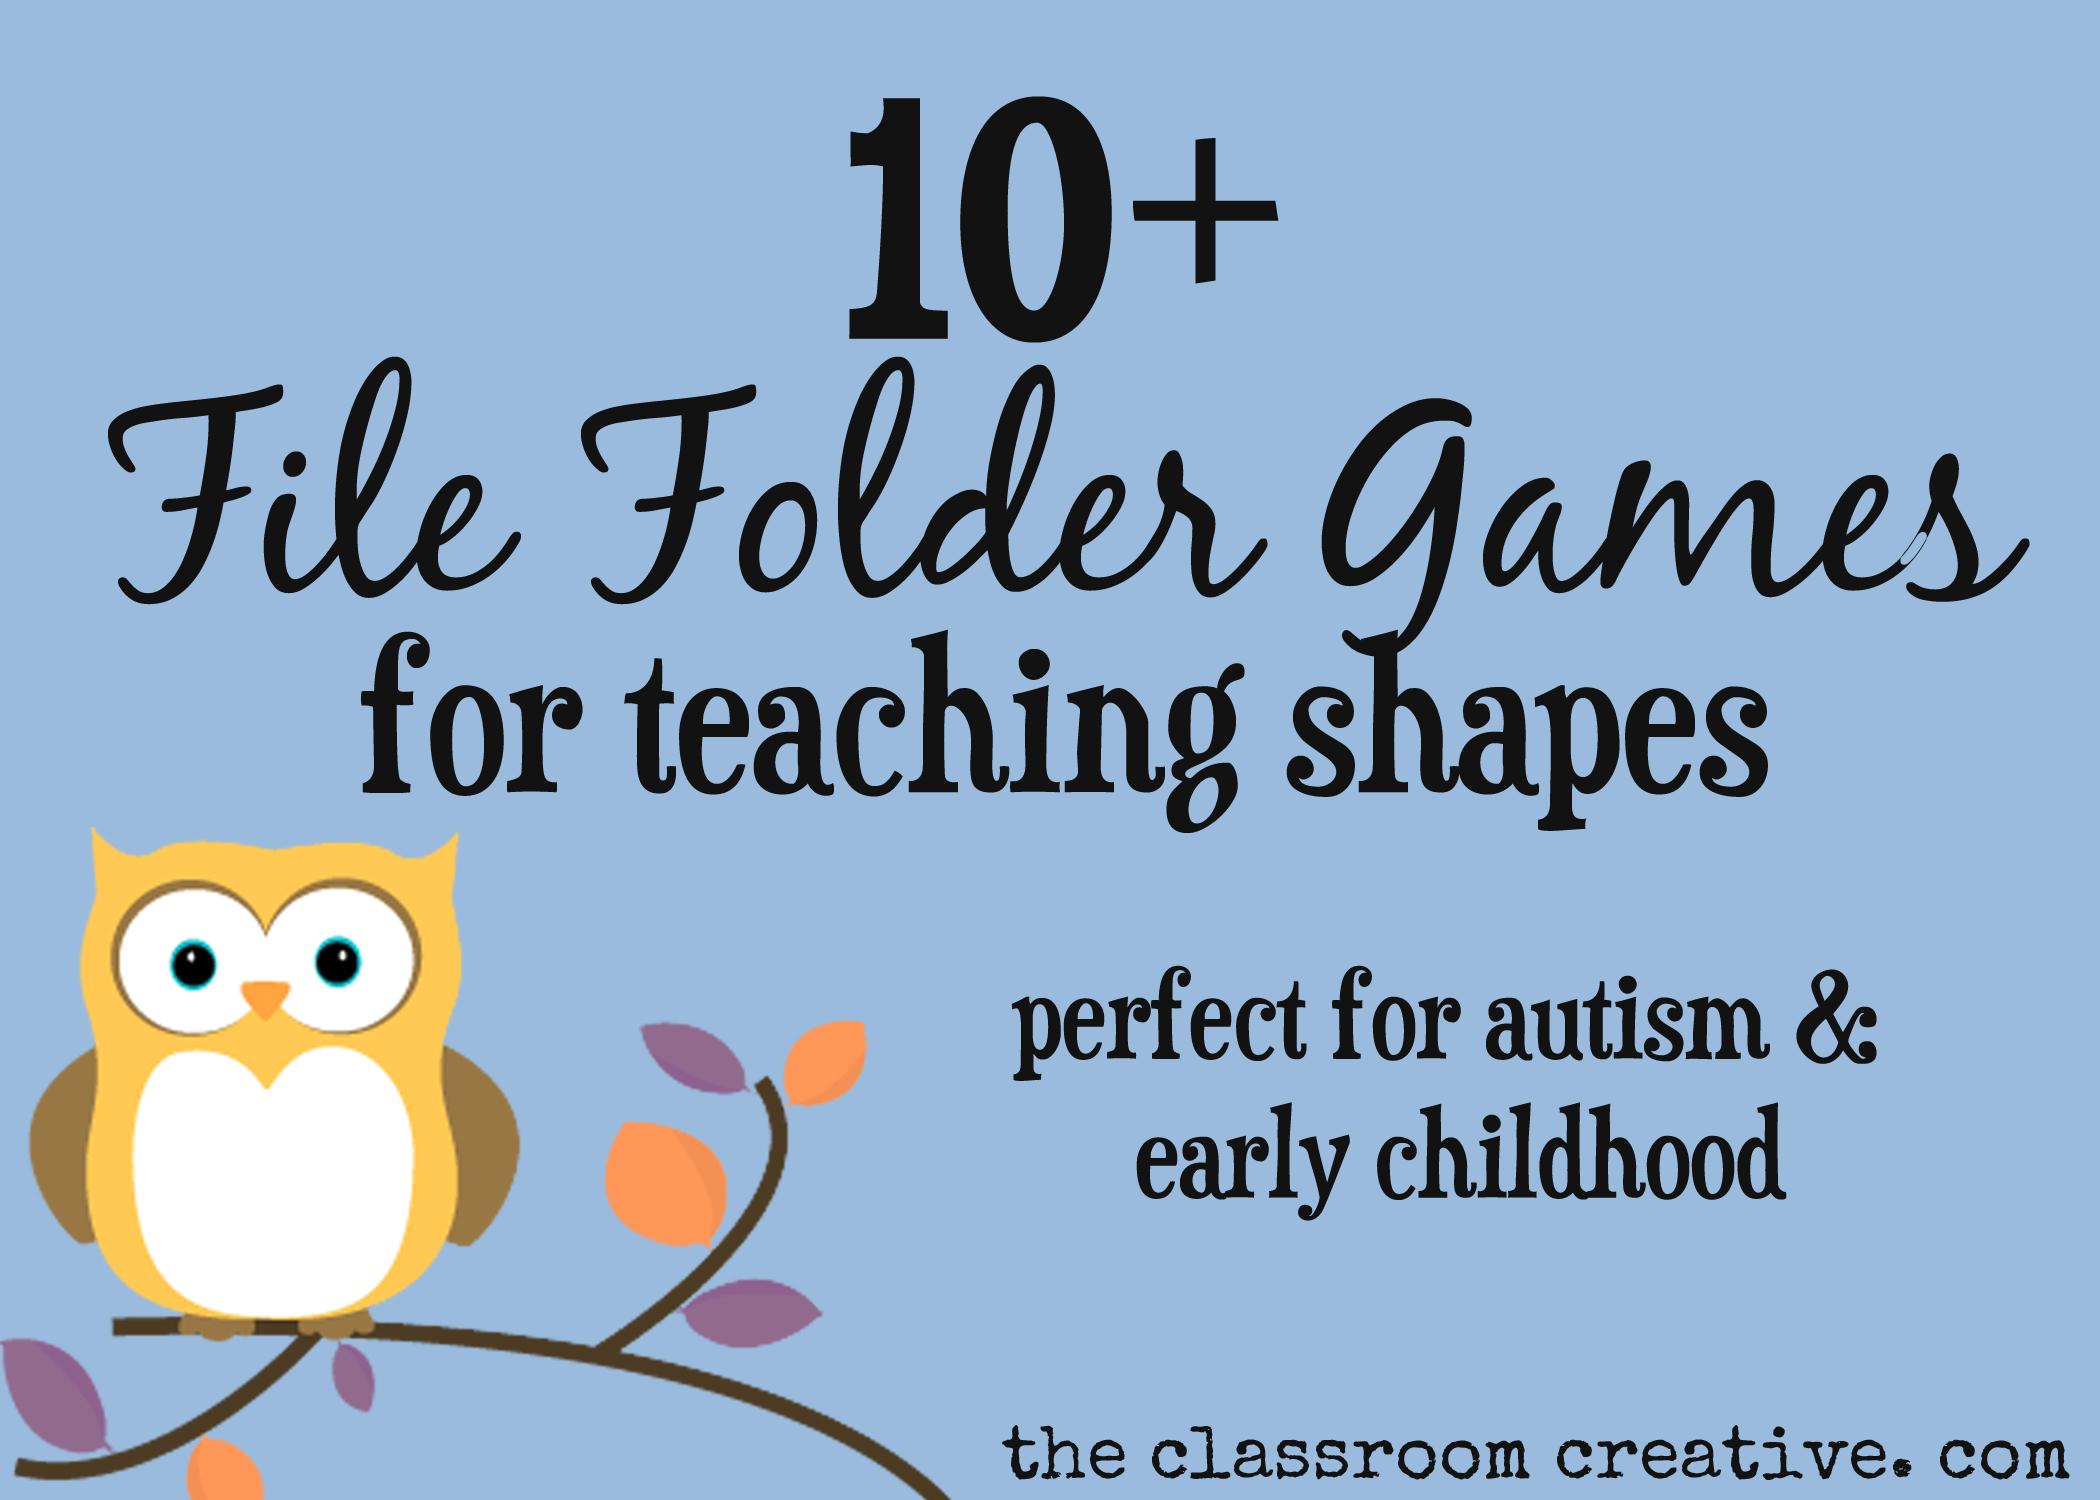 File Folder Games For Teaching Shapes - Free Printable File Folder Games